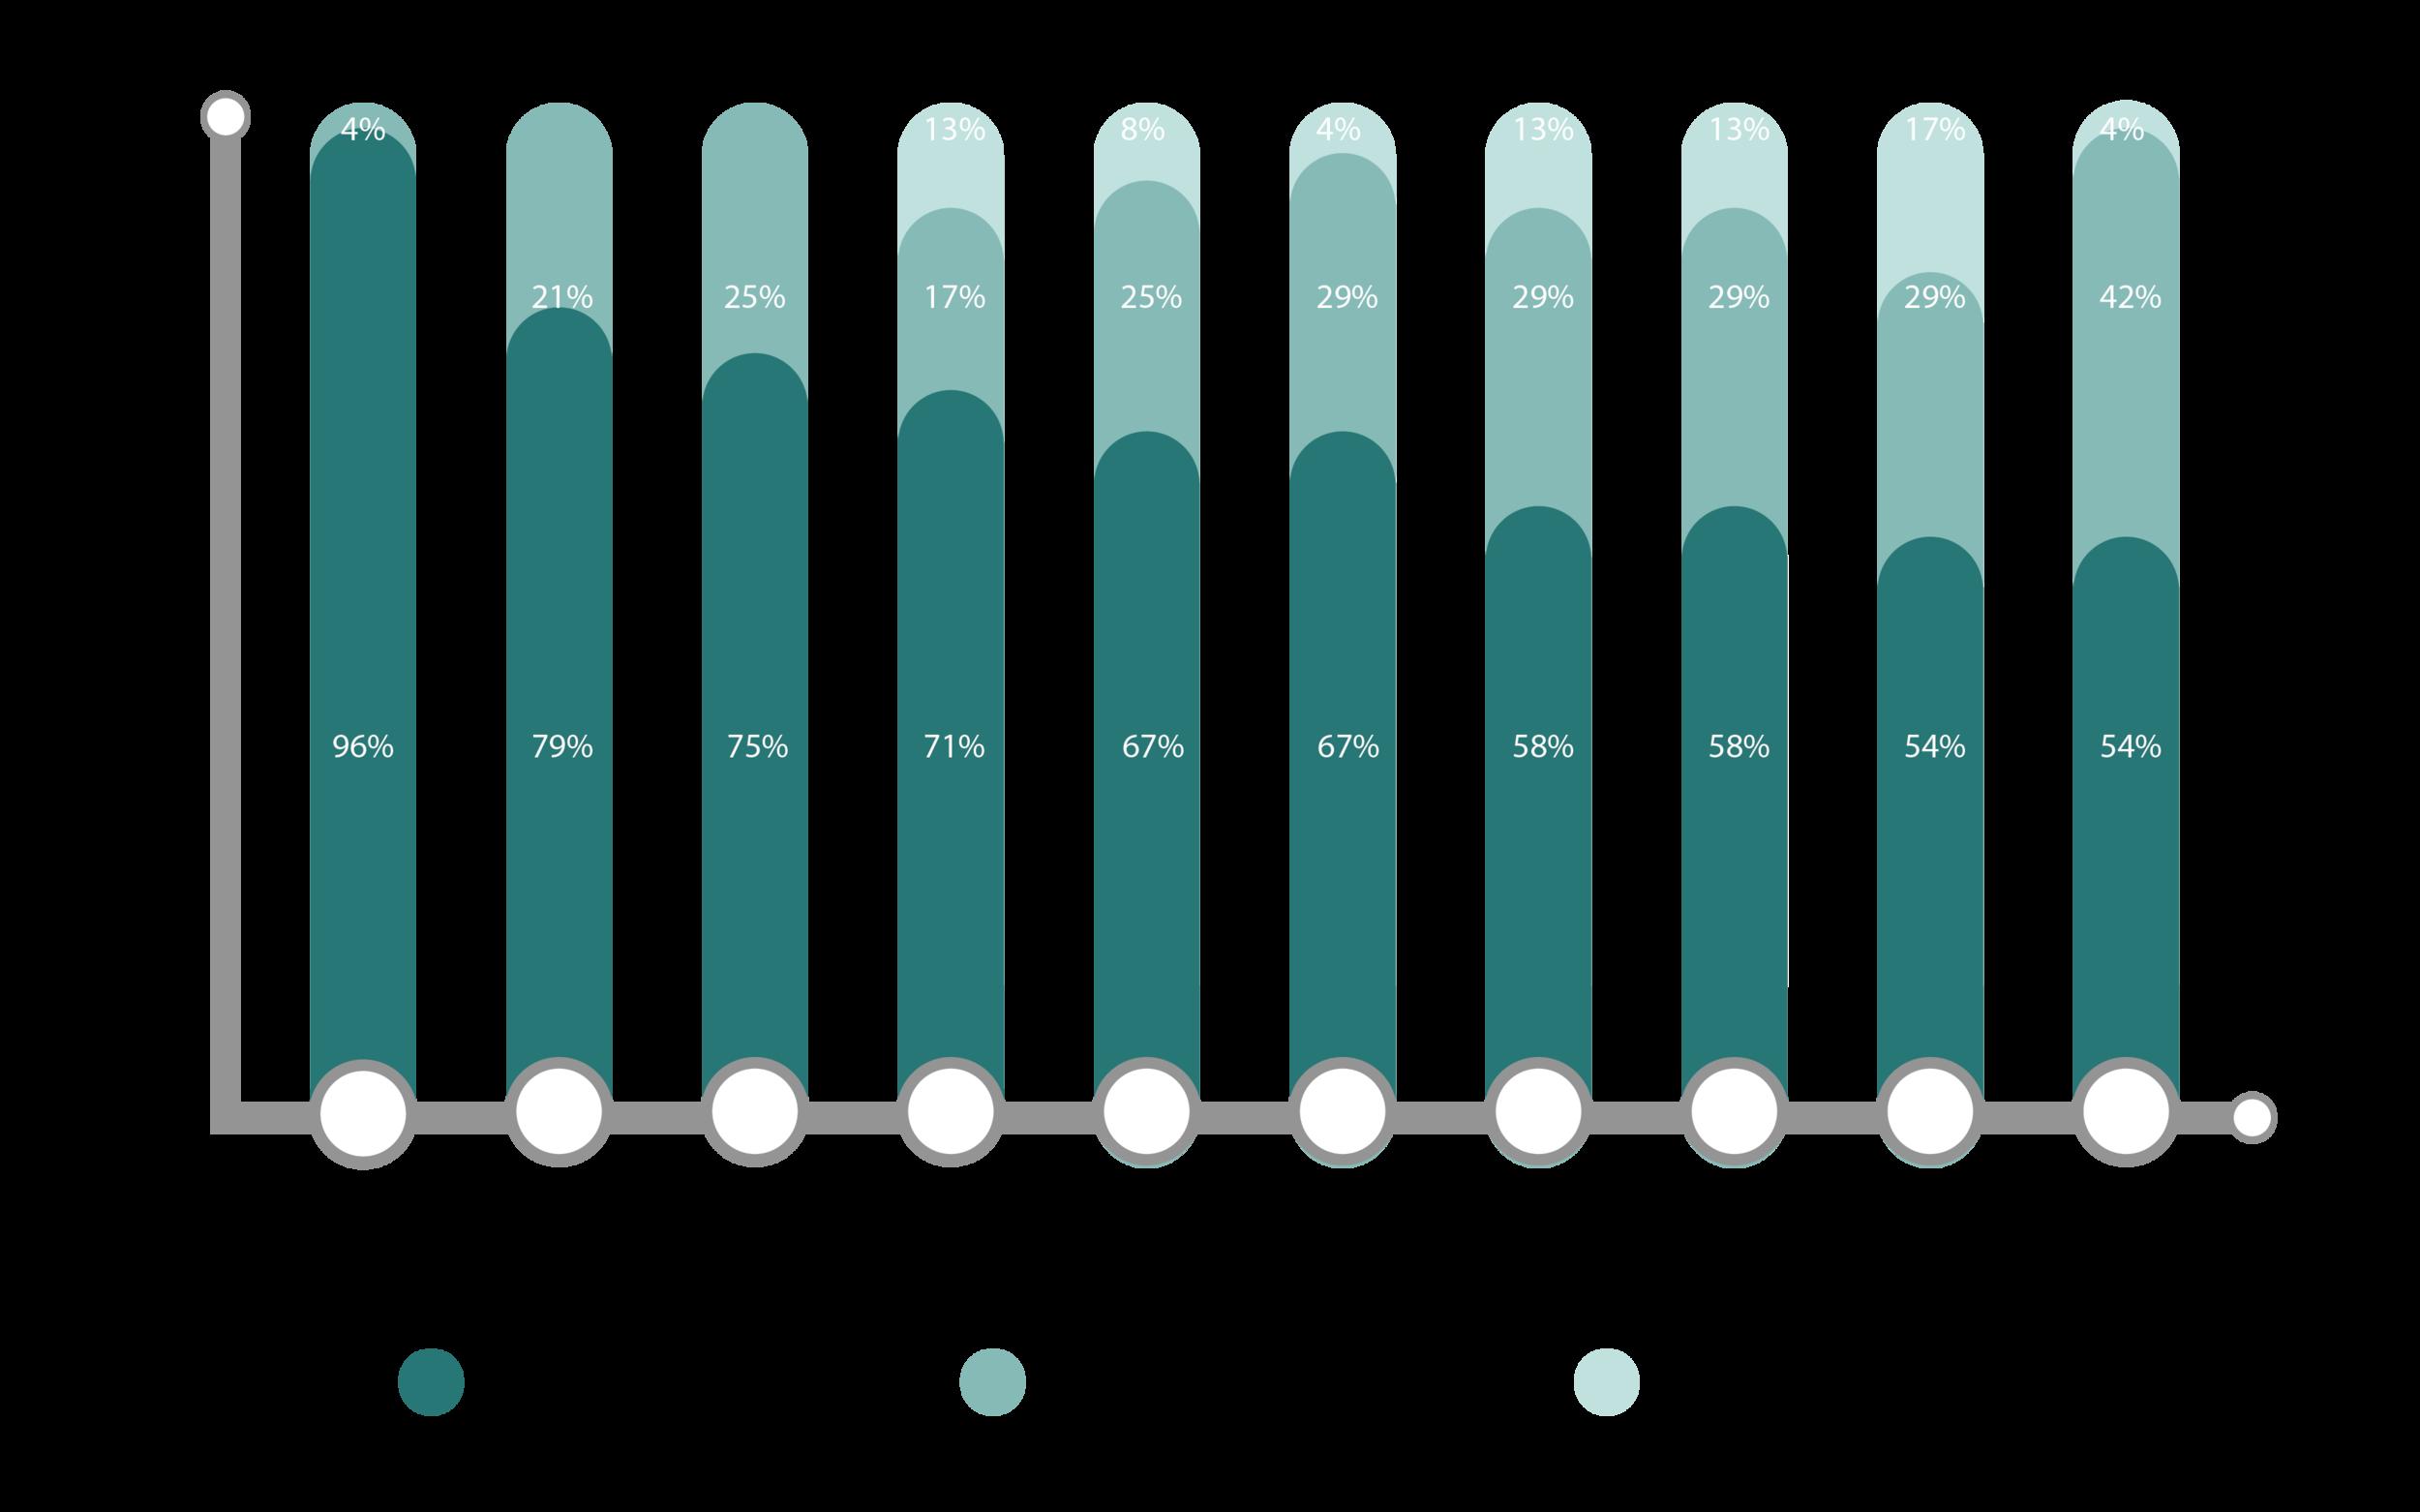 card-sort-graph-01.png